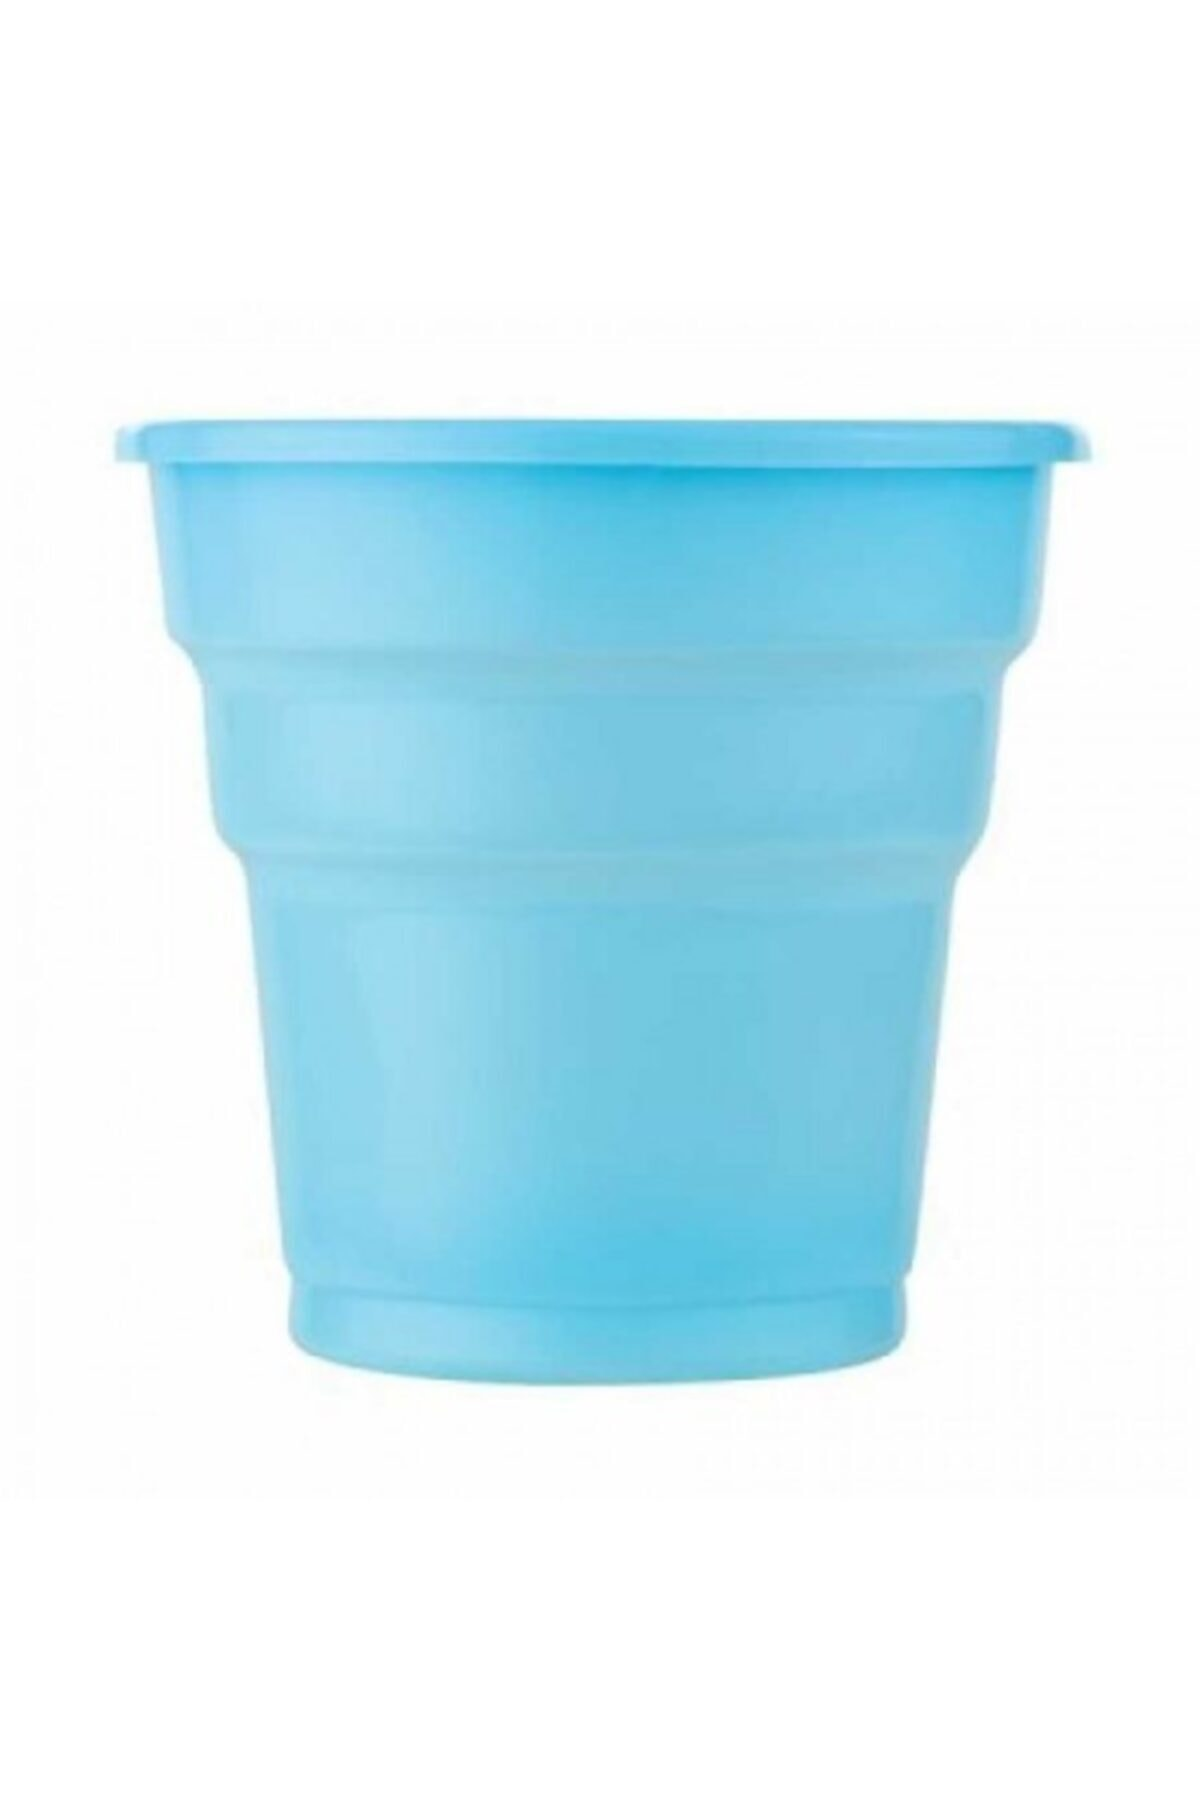 Roll-Up Açık Mavi Plastik Meşrubat Bardağı 25'li 1